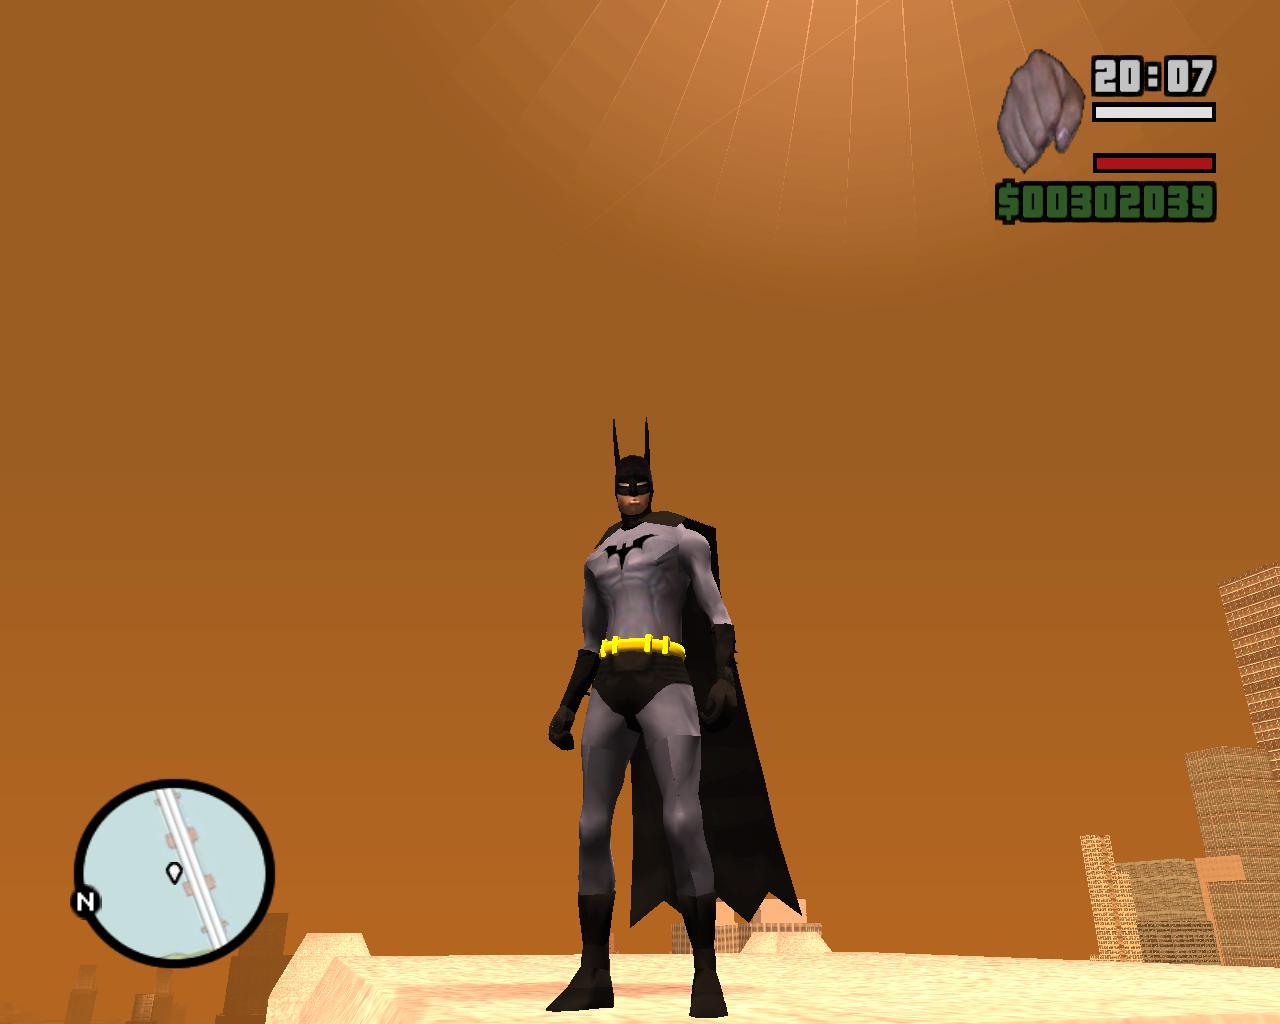 Batman ped addon - GTA WHATEVER mod for Grand Theft Auto: San